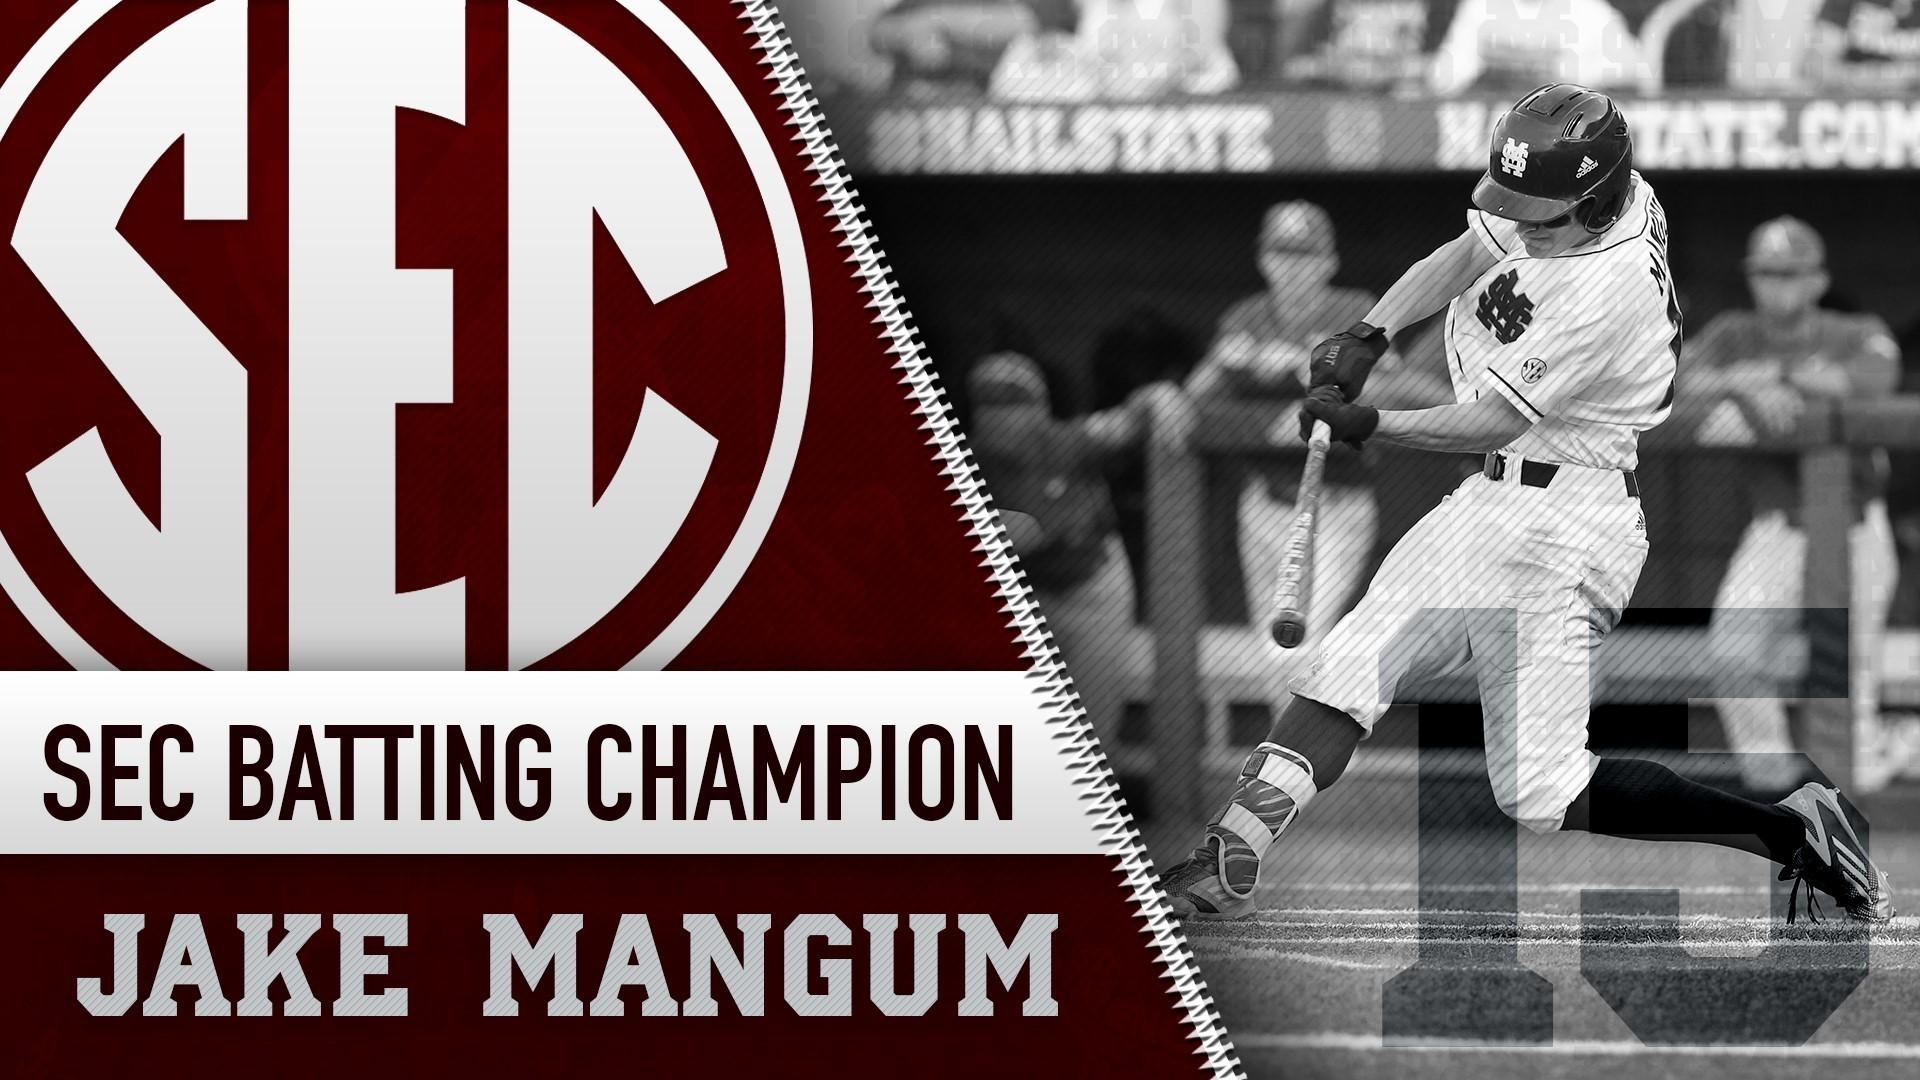 Jake Mangum Caps Stellar Freshman Year with SEC Batting Crown